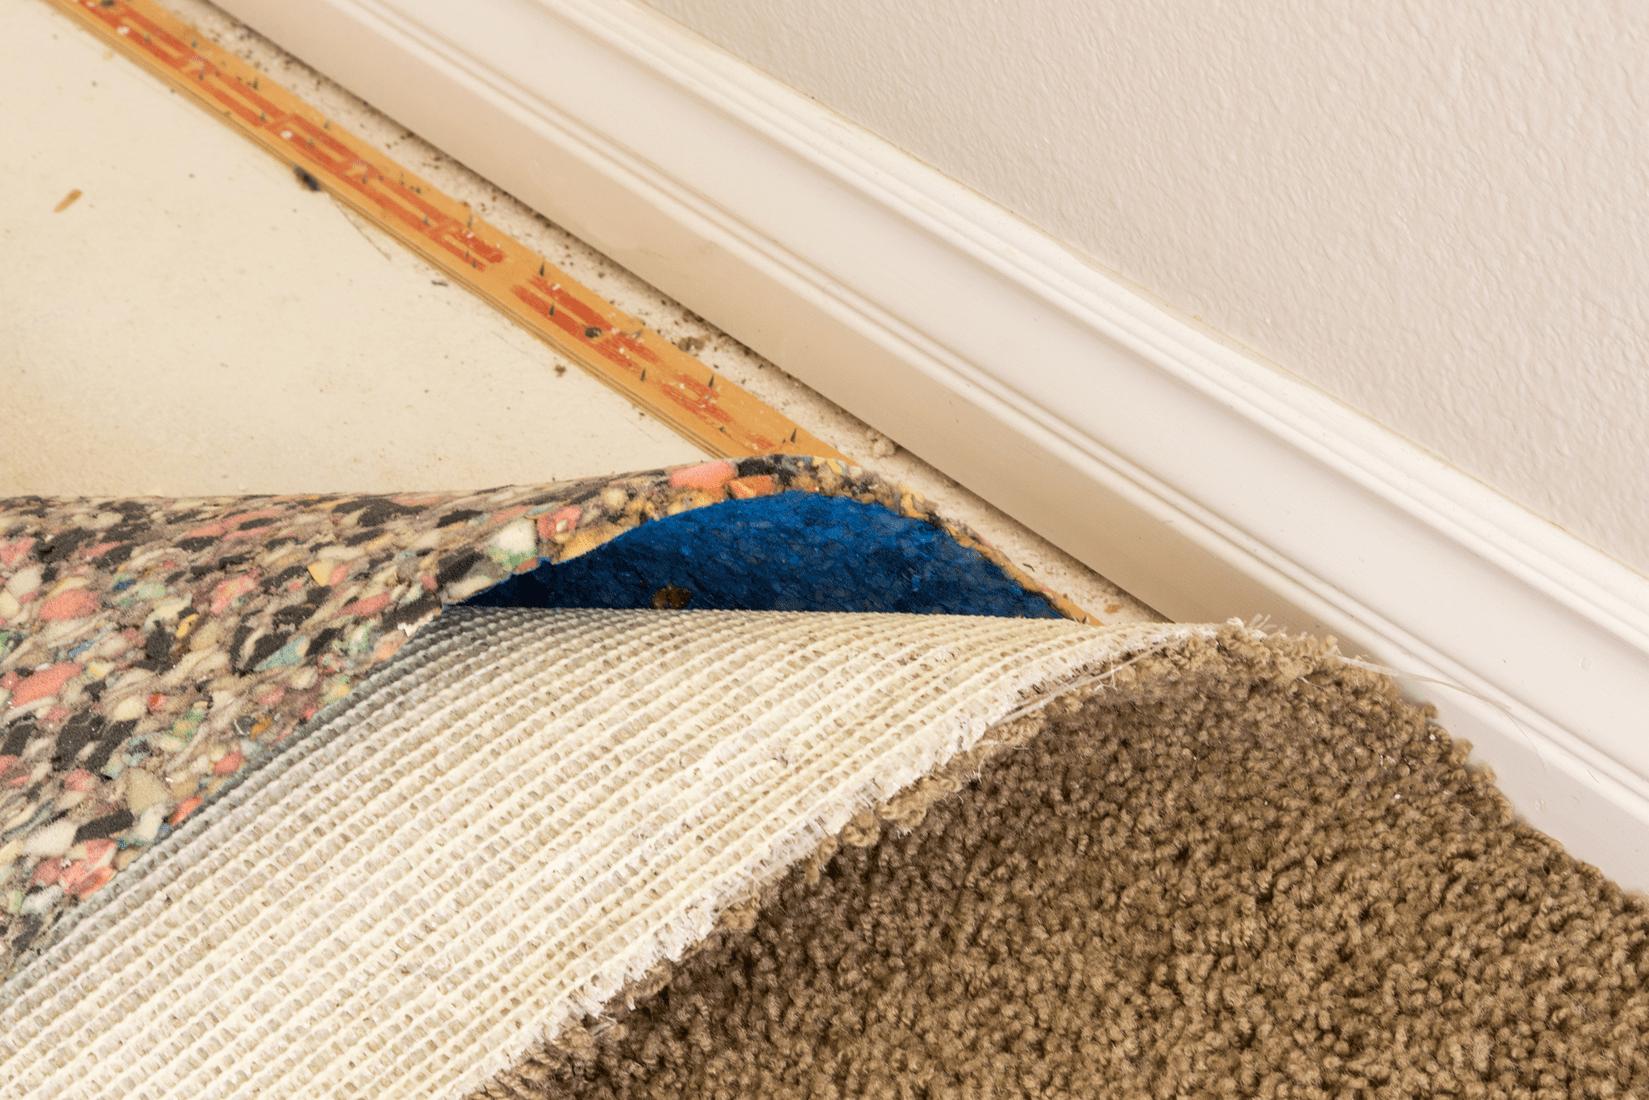 Best Carpet Padding, Pulled Back Carpet and Padding